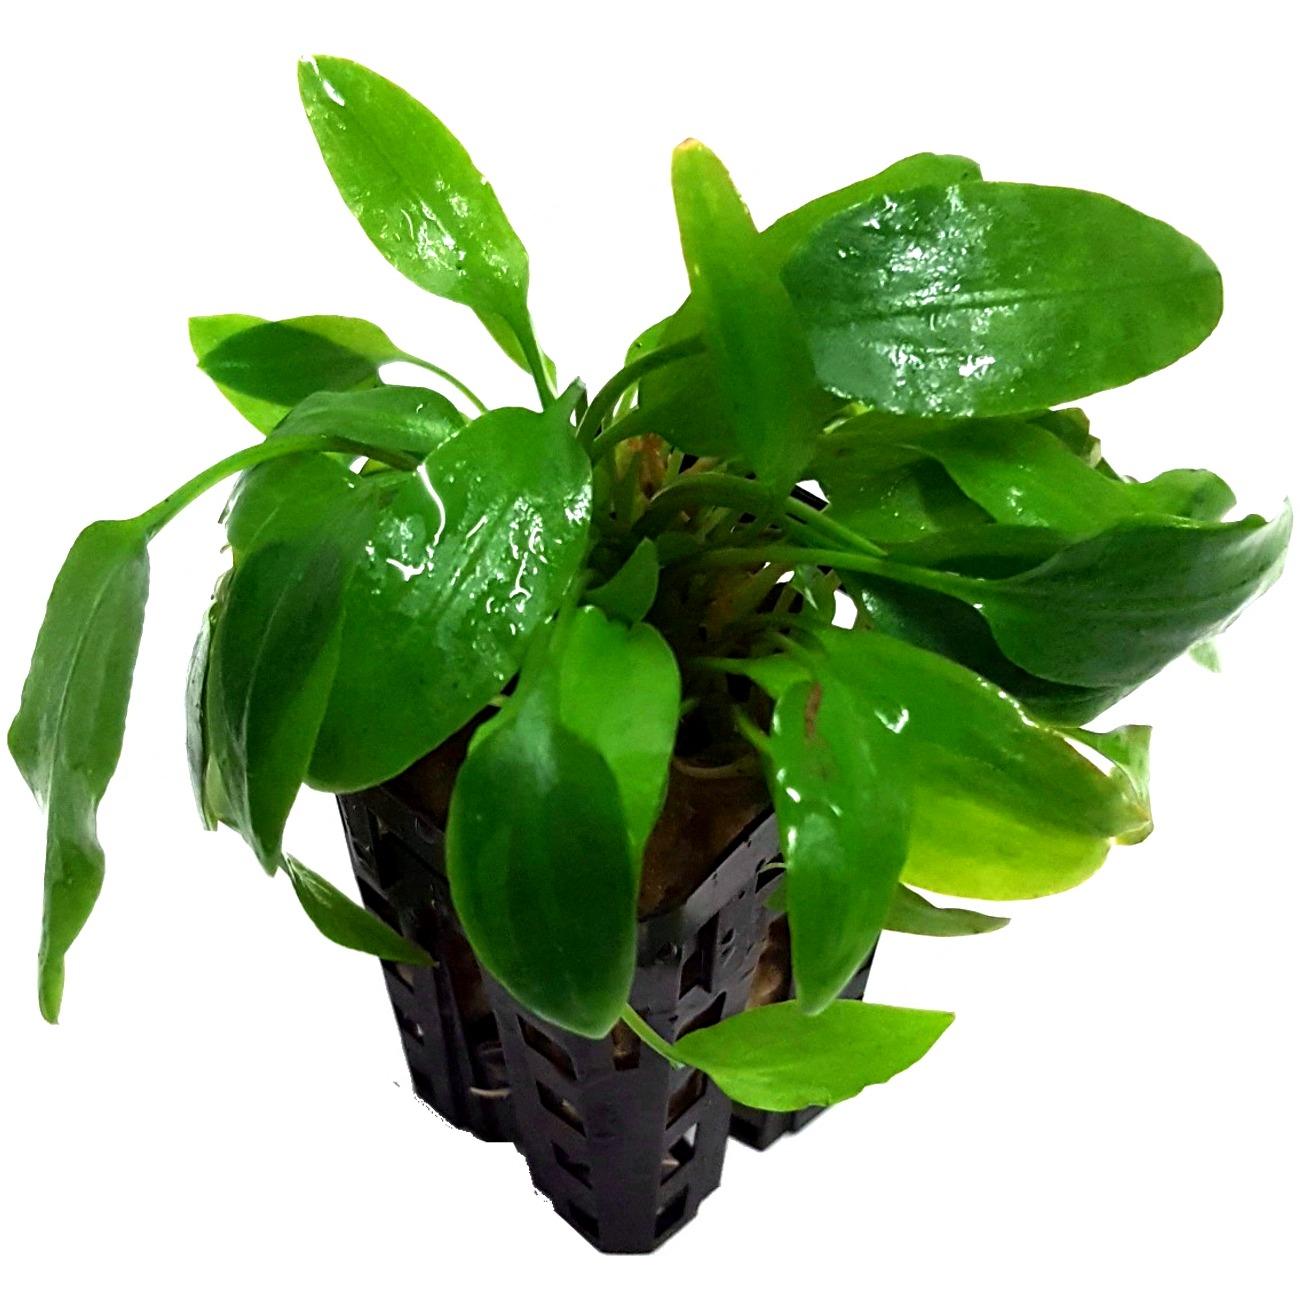 Cryptocoryne wendtii green plante d\'aquarium en pot de diamètre 5 cm